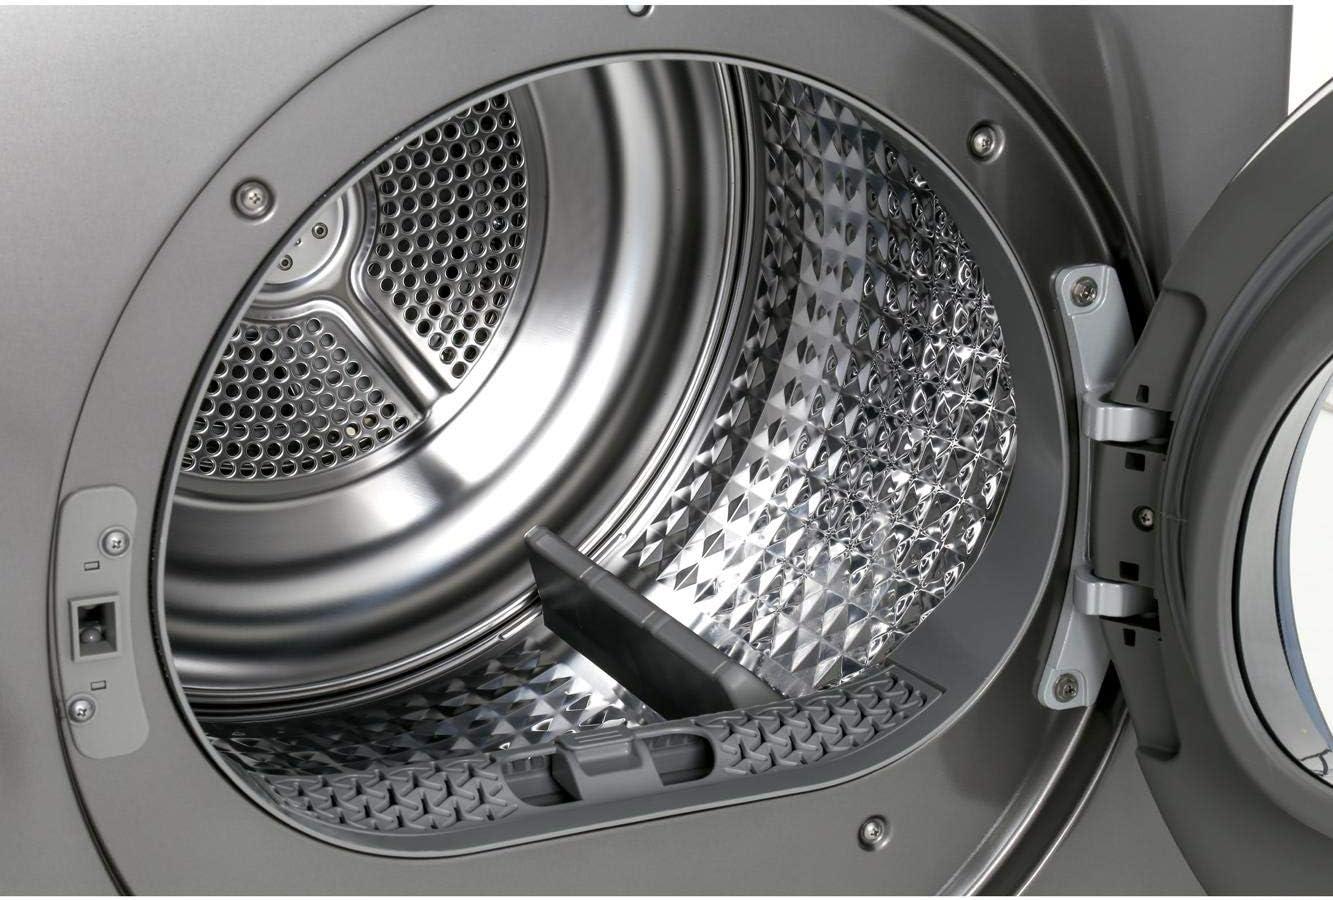 Dryers Condenser Dryers Rated Condenser Tumble Dryer Samsung ...